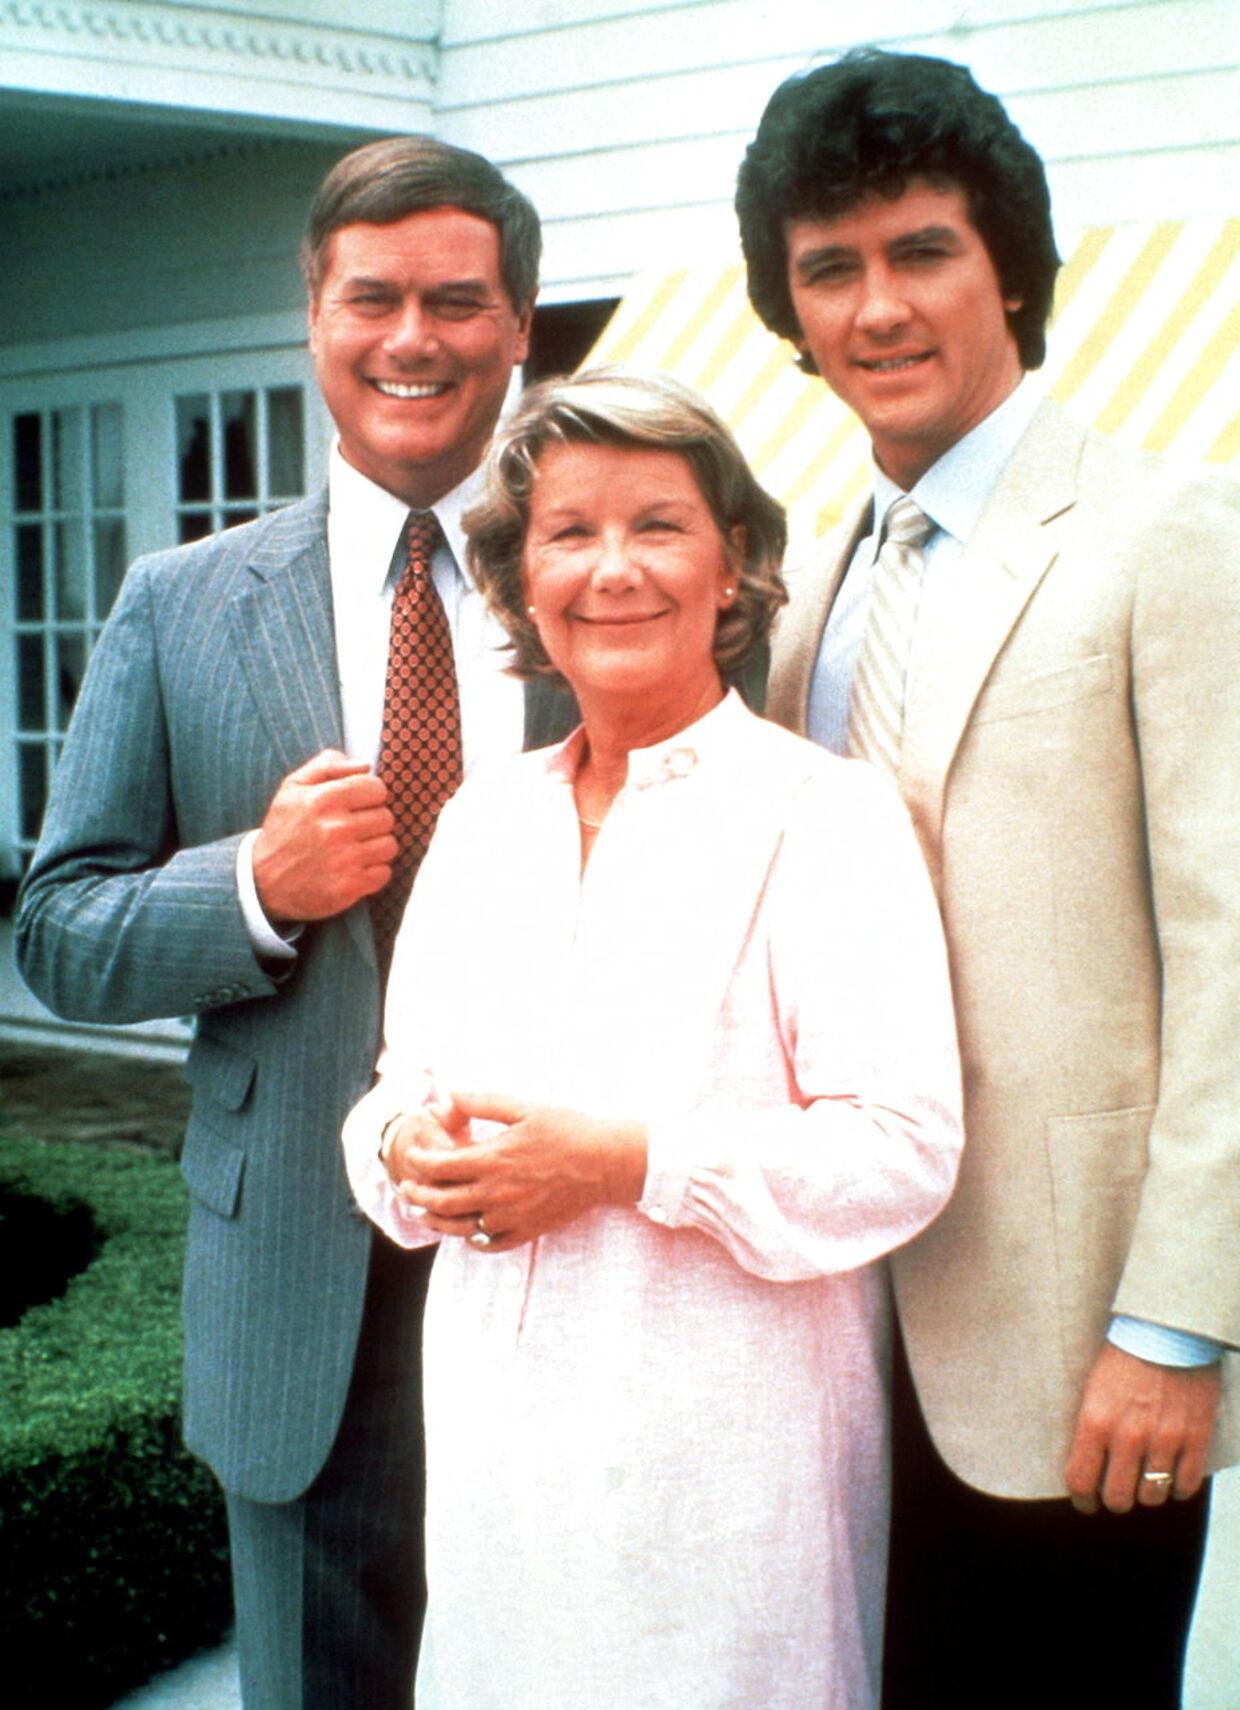 Larry Hagman som J. R. Ewing, Barabara Bel Geddes som 'Miss Ellie' og Patrick Duffy som en gode søn, Bobby Ewing.